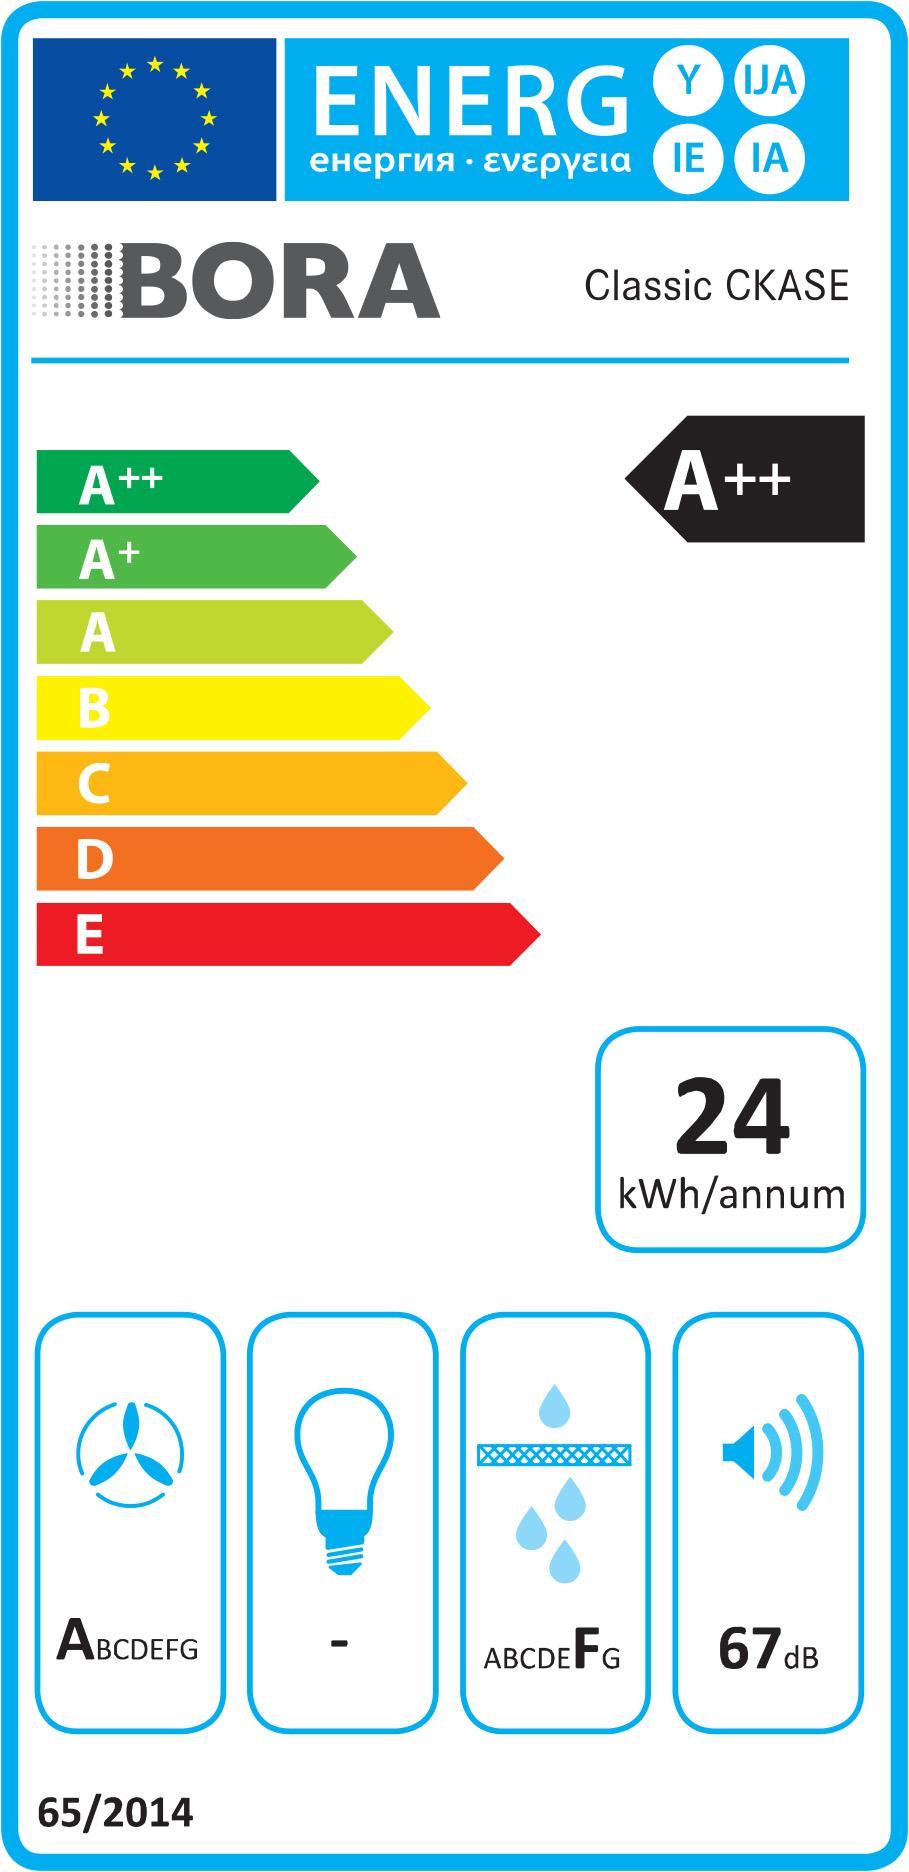 Bora Energielabel